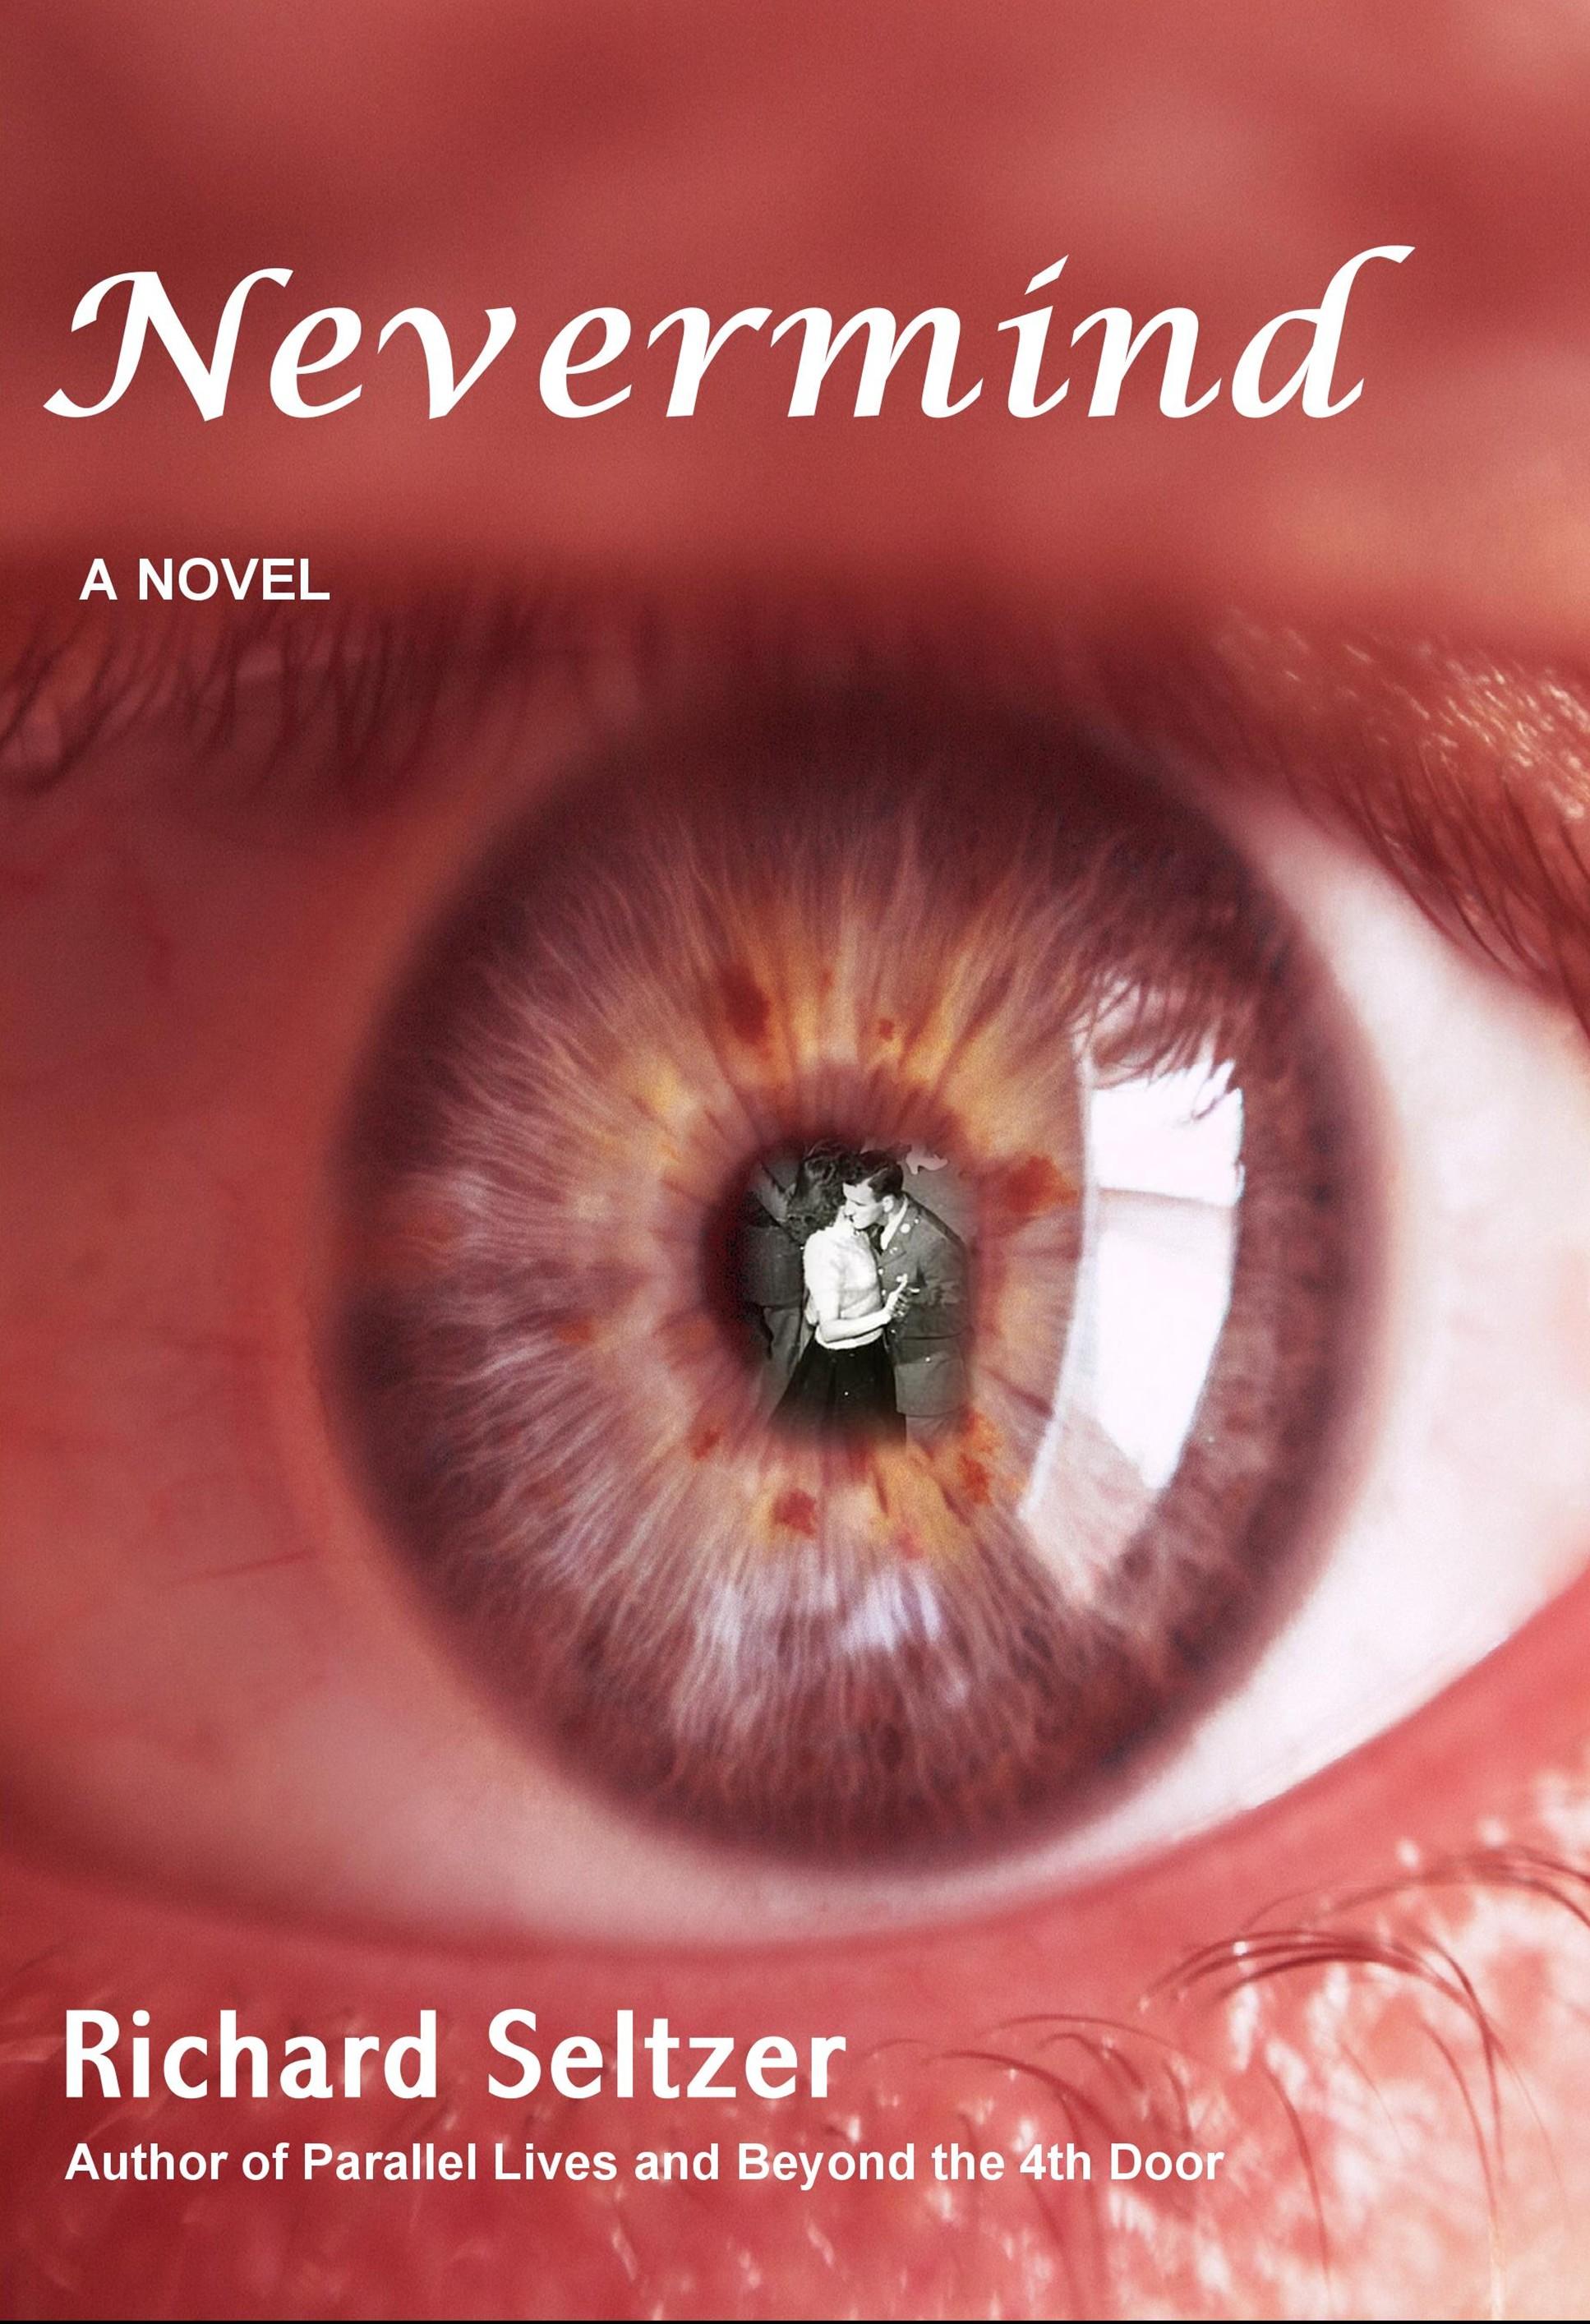 Nevermind by Richard Seltzer